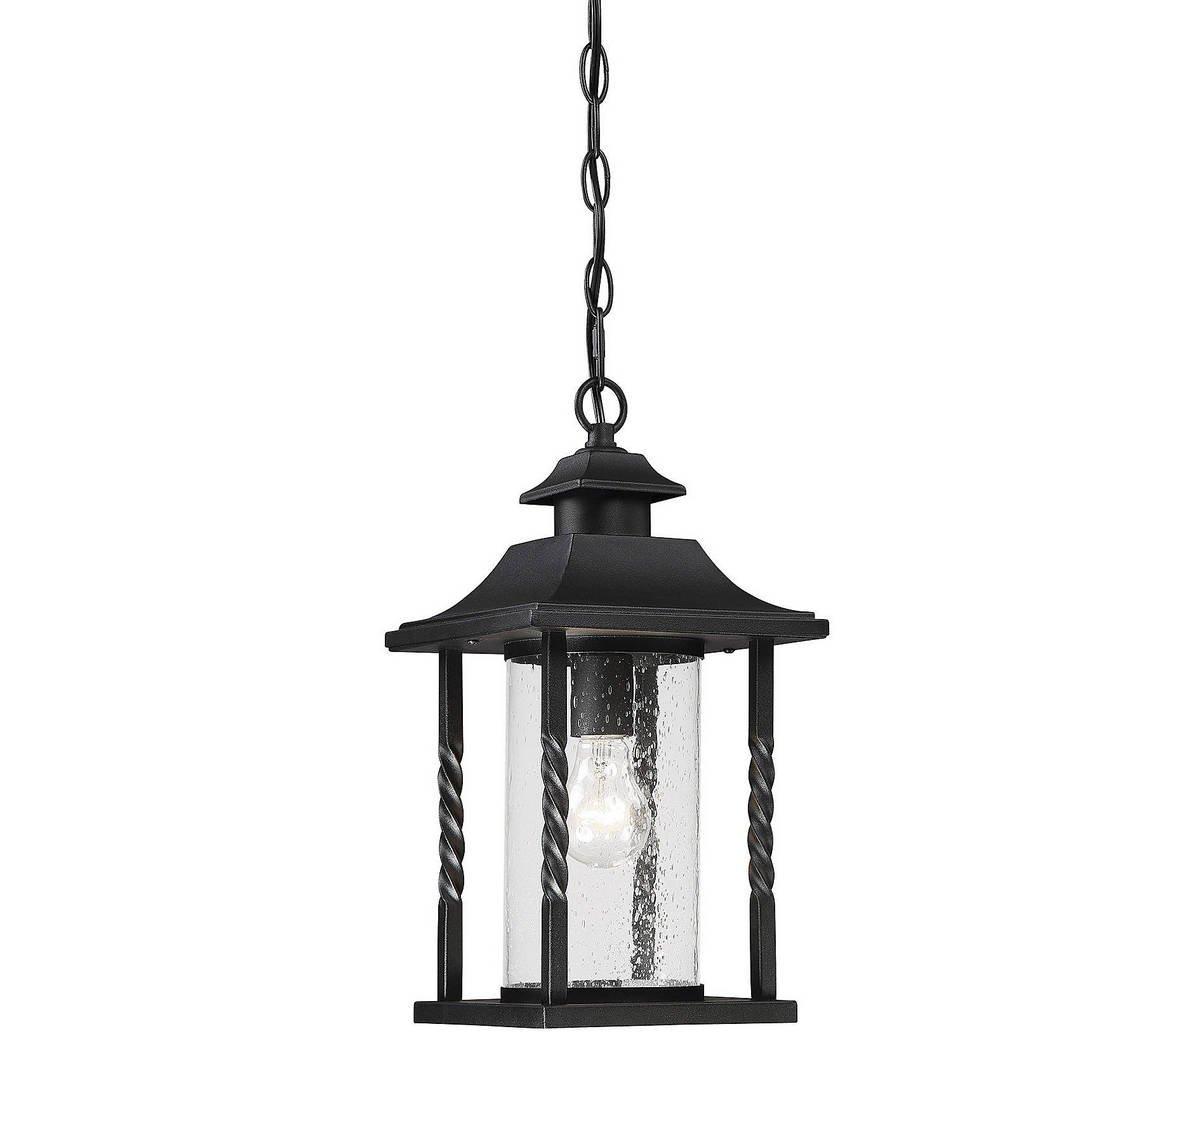 Savoy House 5-1232-BK Dorado Outdoor Hanging Lantern in Black by Savoy House